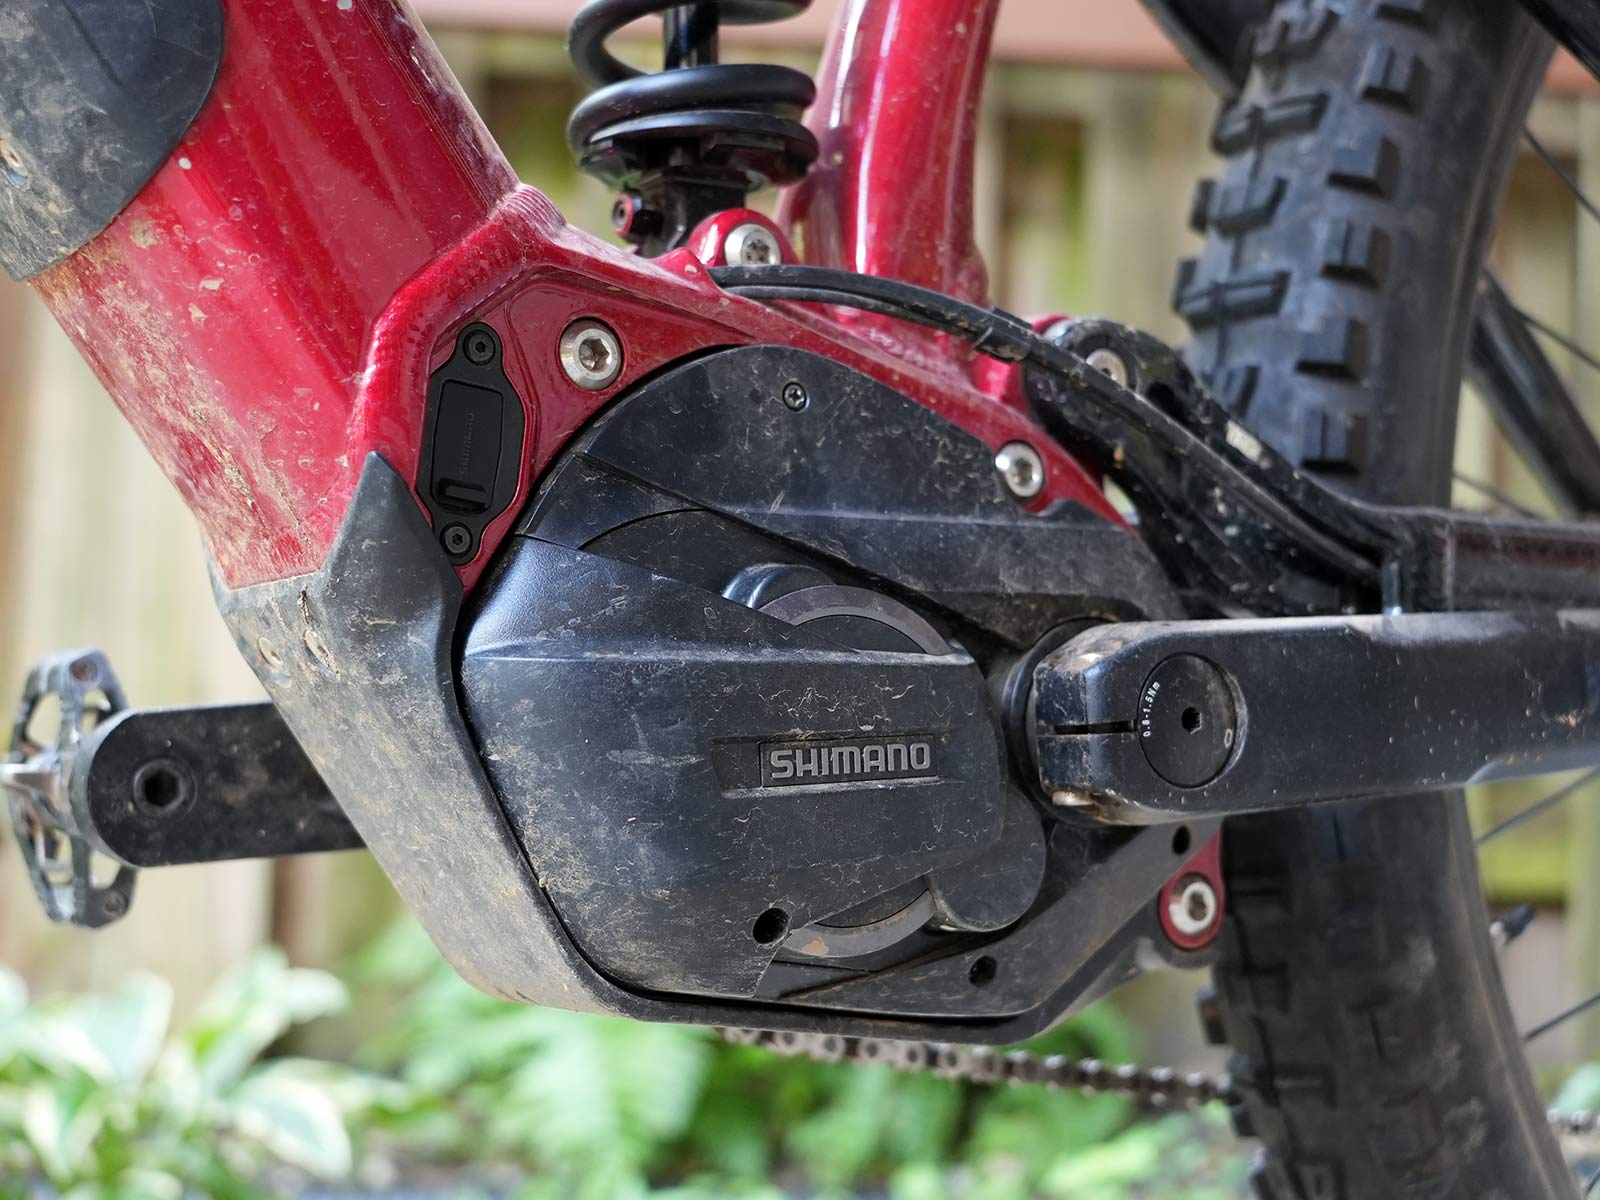 shimano e-bike motor with custom casing on a Marin eMTB